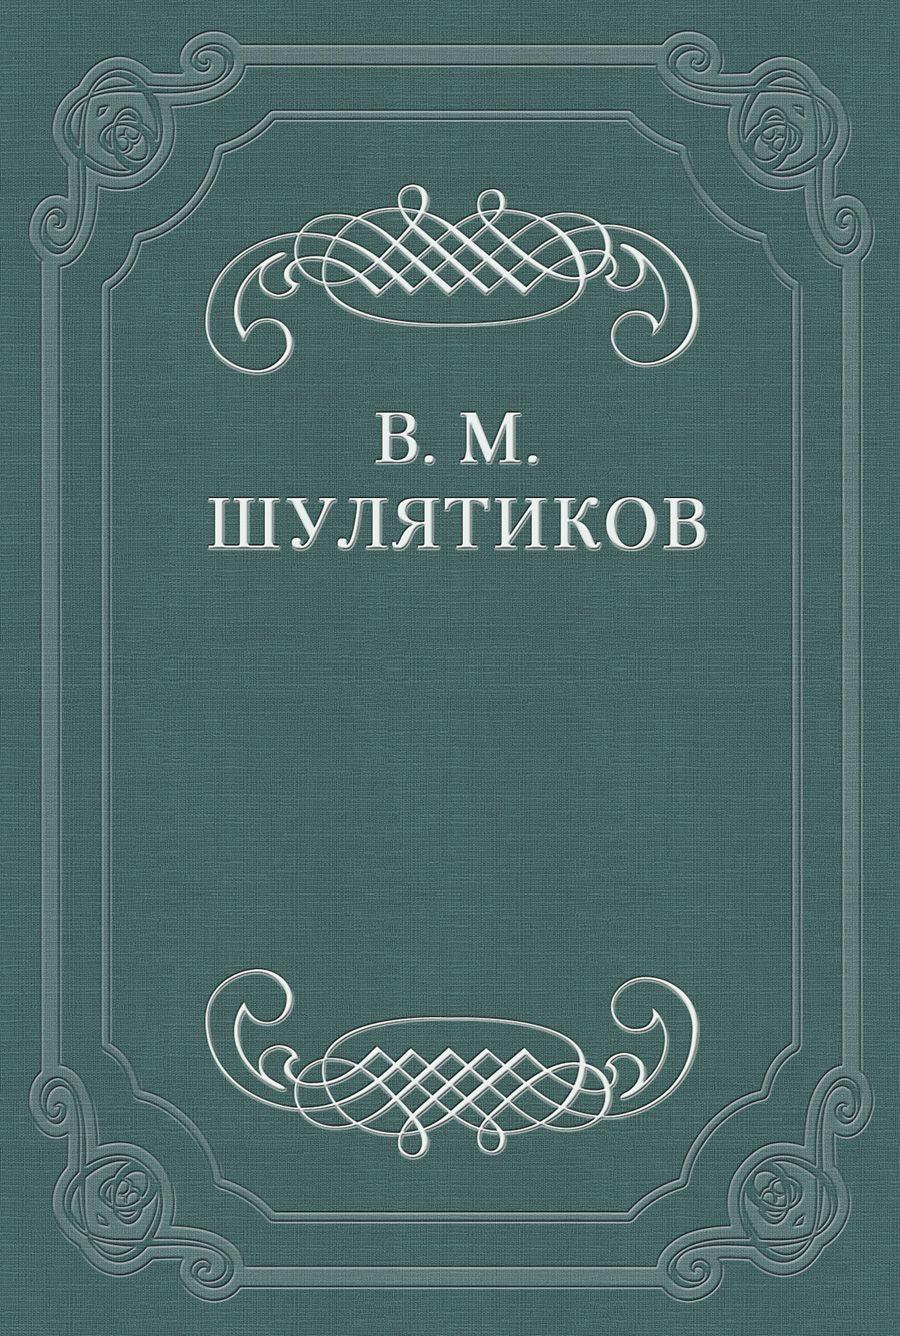 Владимир Михайлович Шулятиков Теоретик интеллигенции